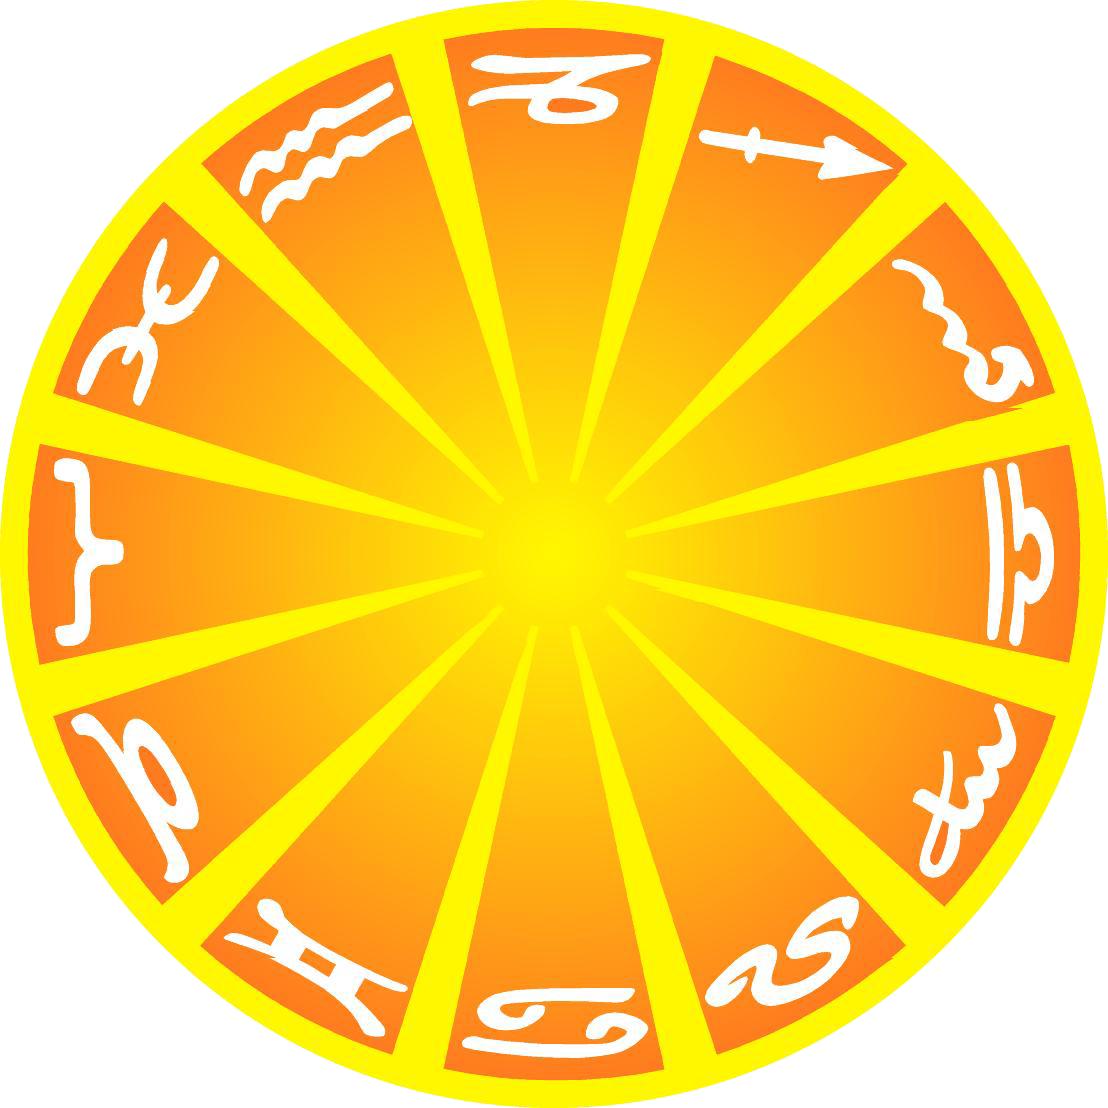 Astrologie Psychologie Ausbildung Düsseldorf